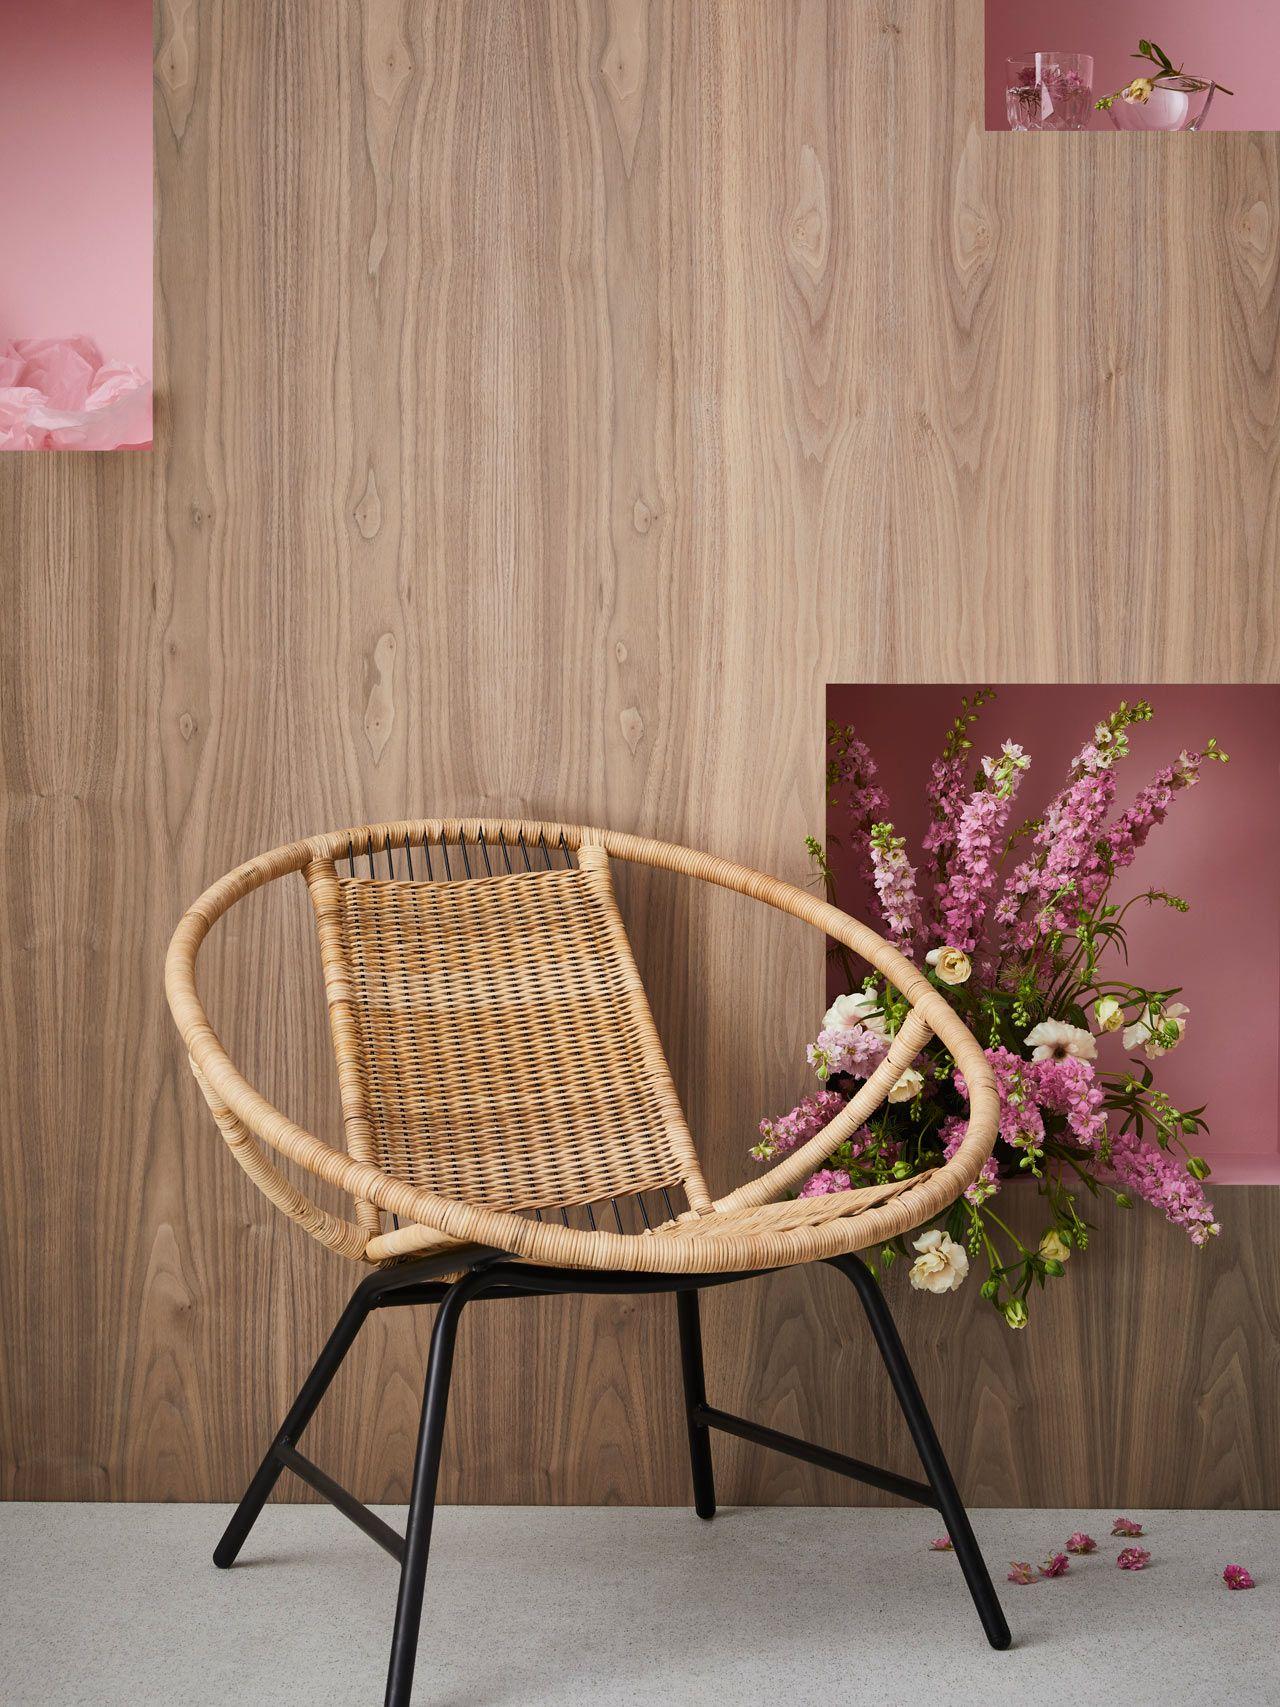 Vintage Launches 75th Gratulera Celebrate To Ikea Collection 7b6vYfgy